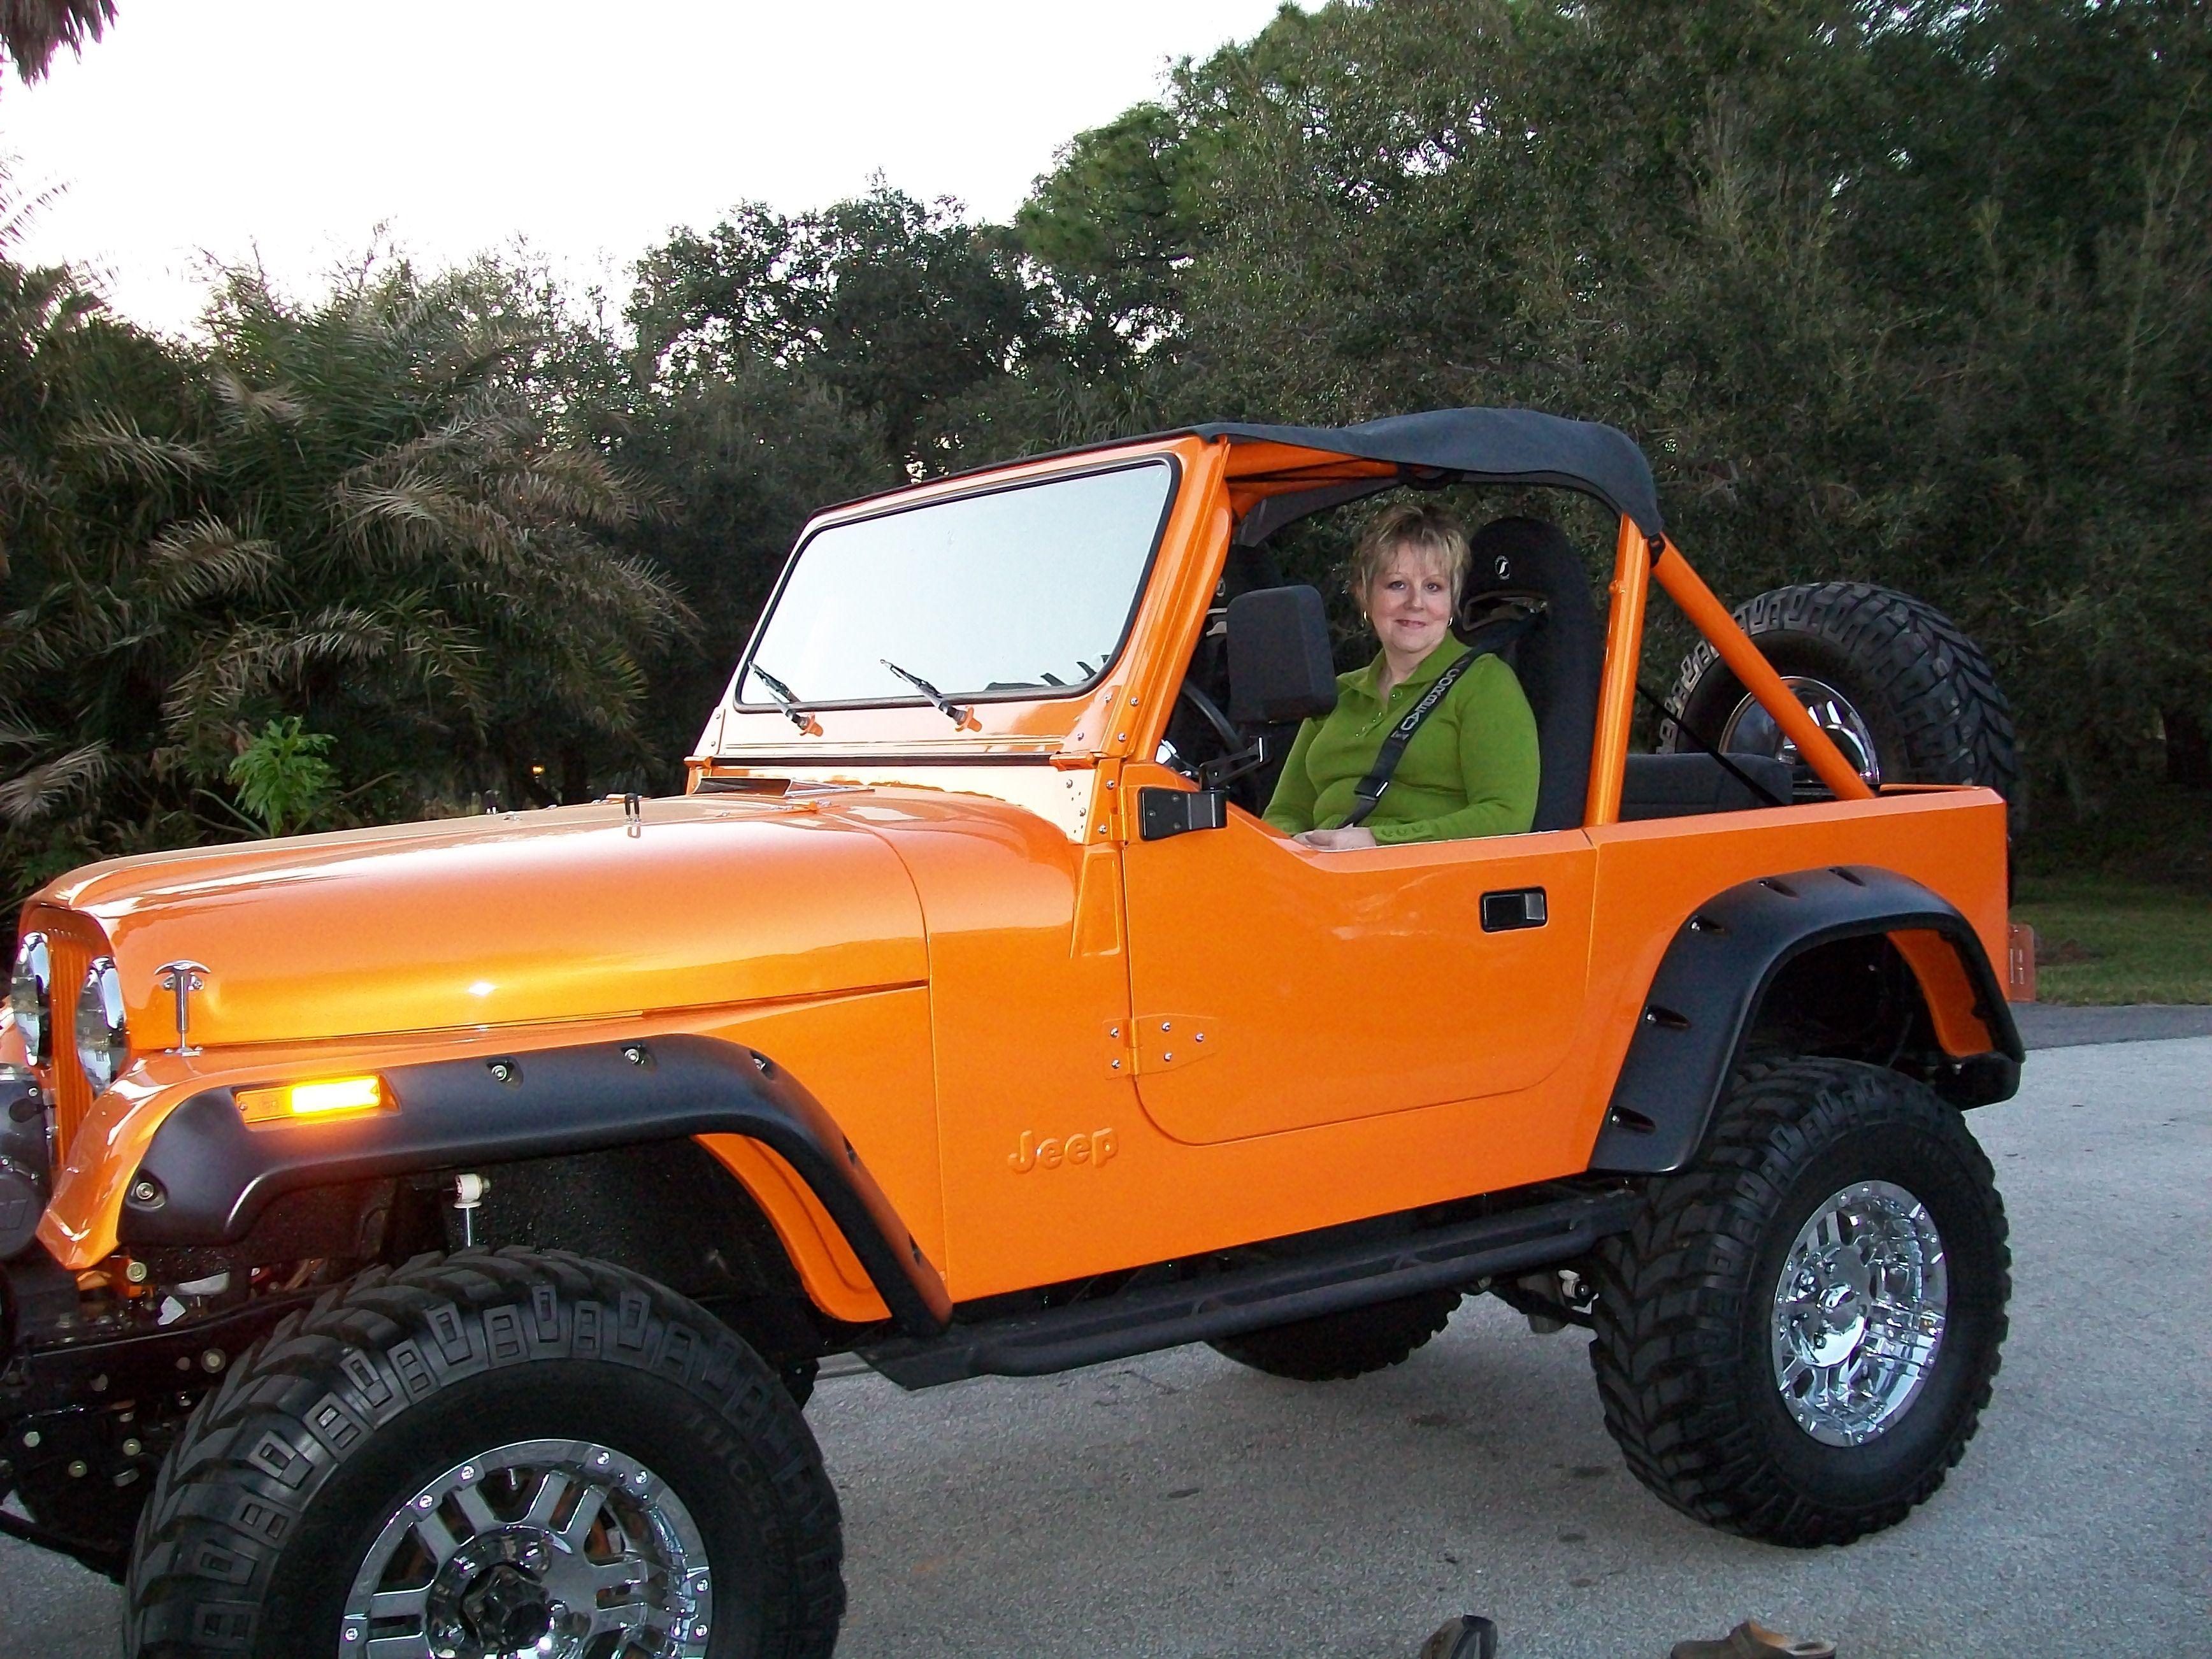 Restored Jeep Cj 7 Someday Our Jeep Will Look Like This One Jeep Swag Jeep Cj Jeep Cj7